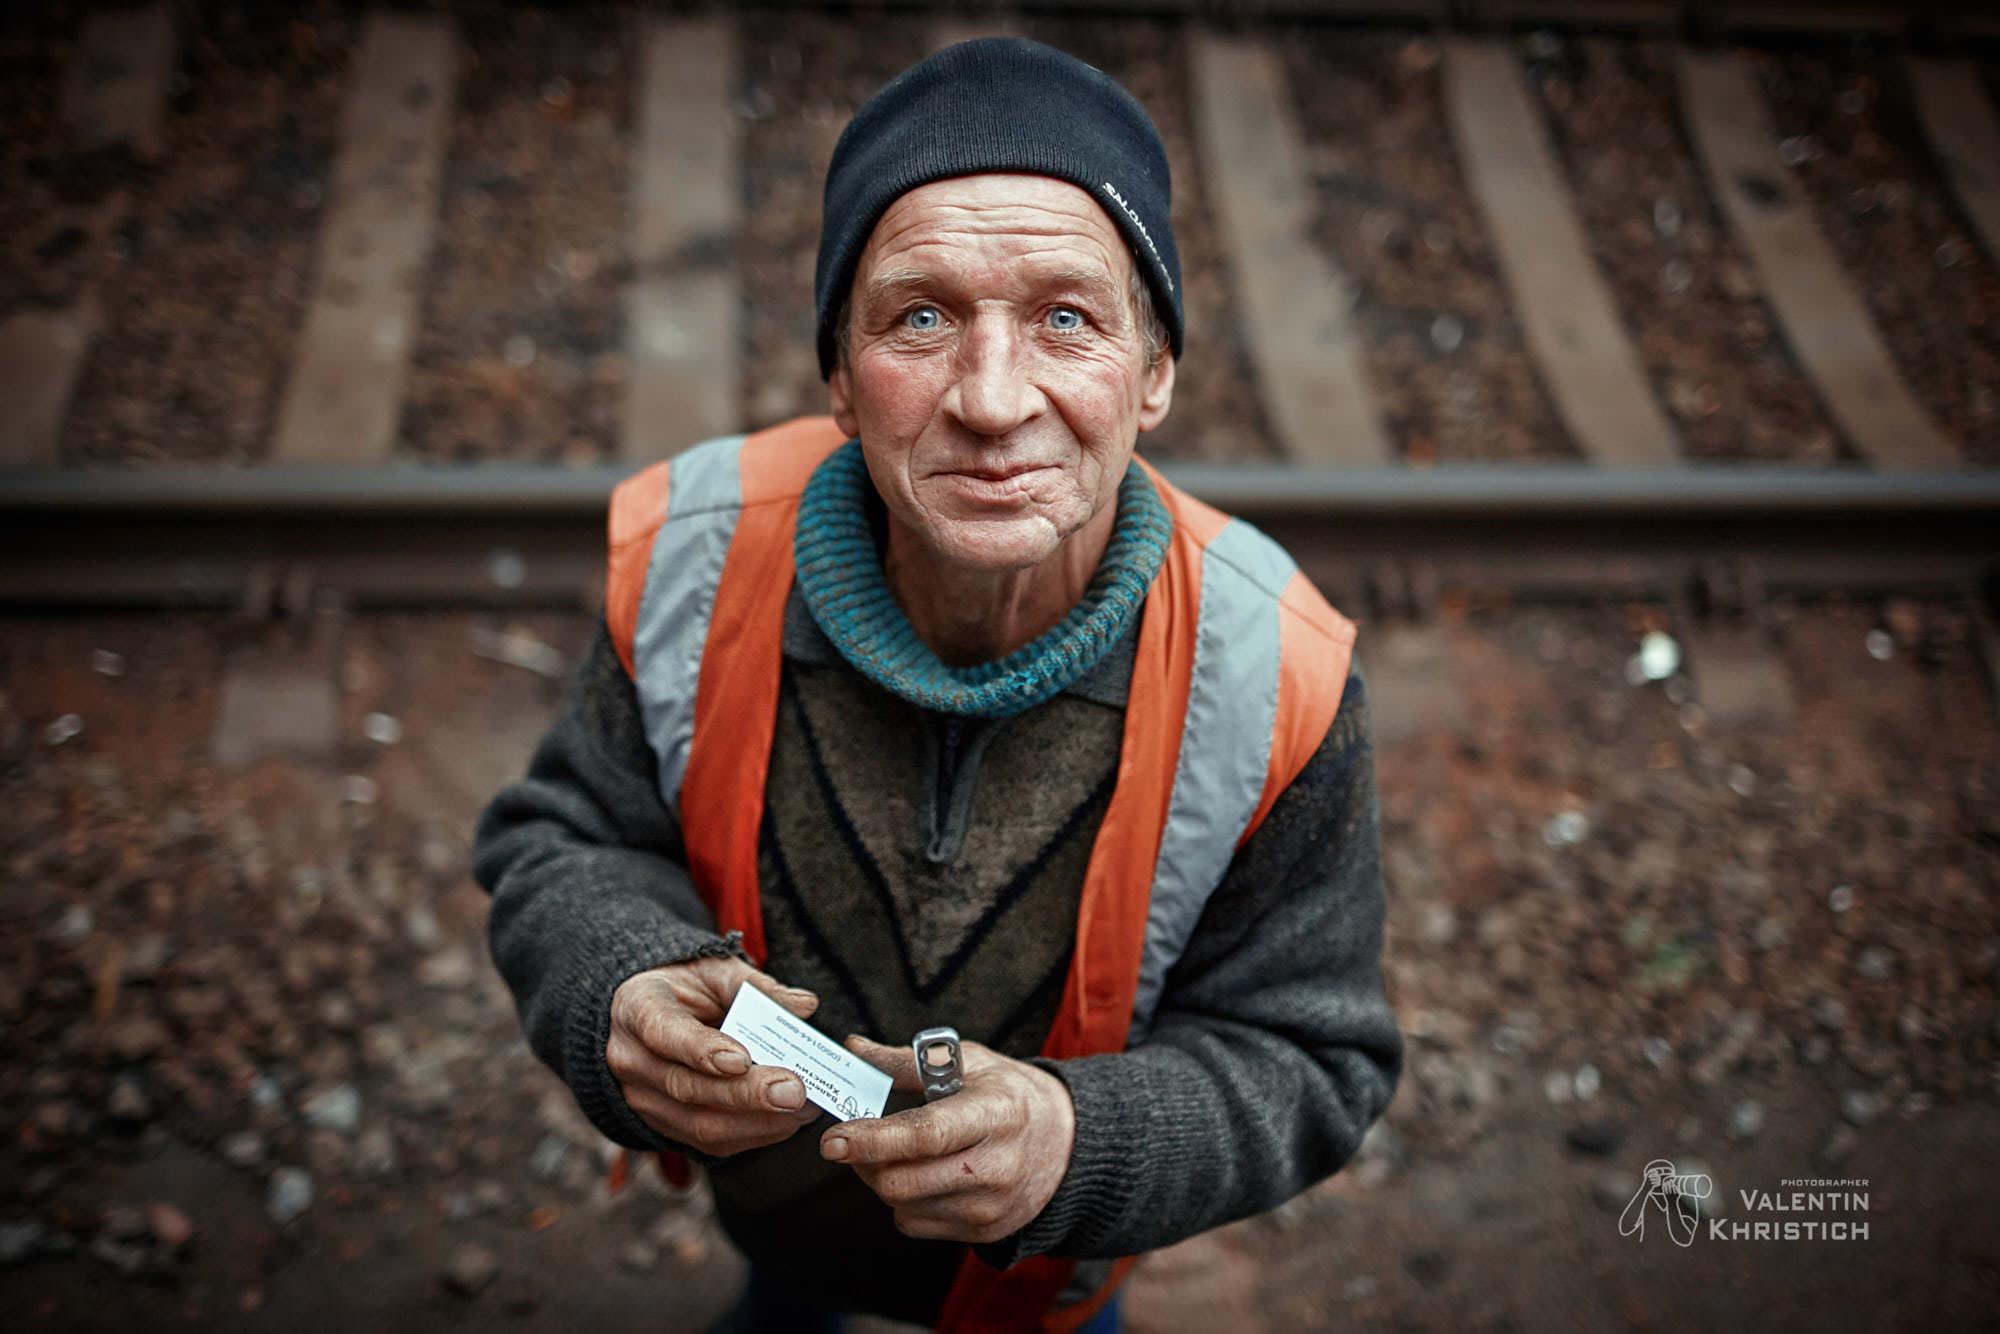 Валентин христич фотограф ищем стилиста